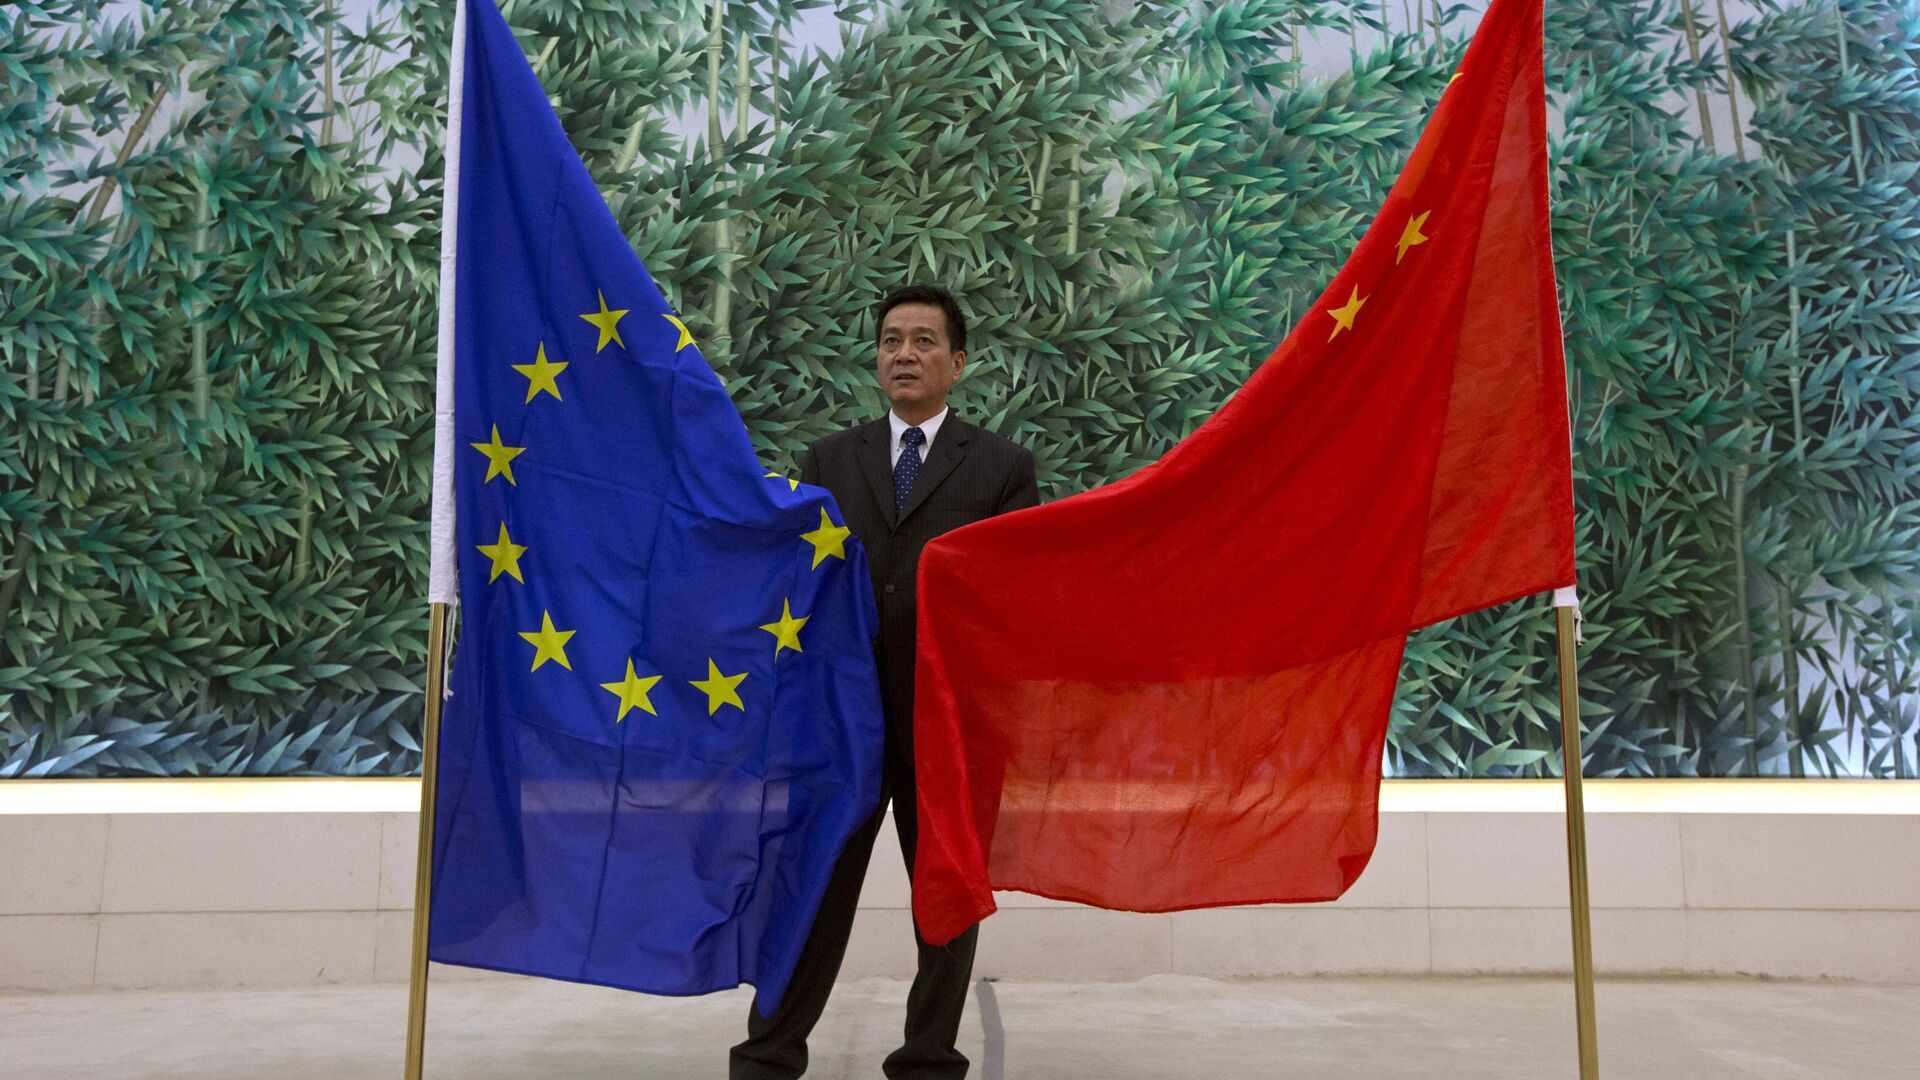 Bandiere UE e Cina - Sputnik Italia, 1920, 29.05.2021